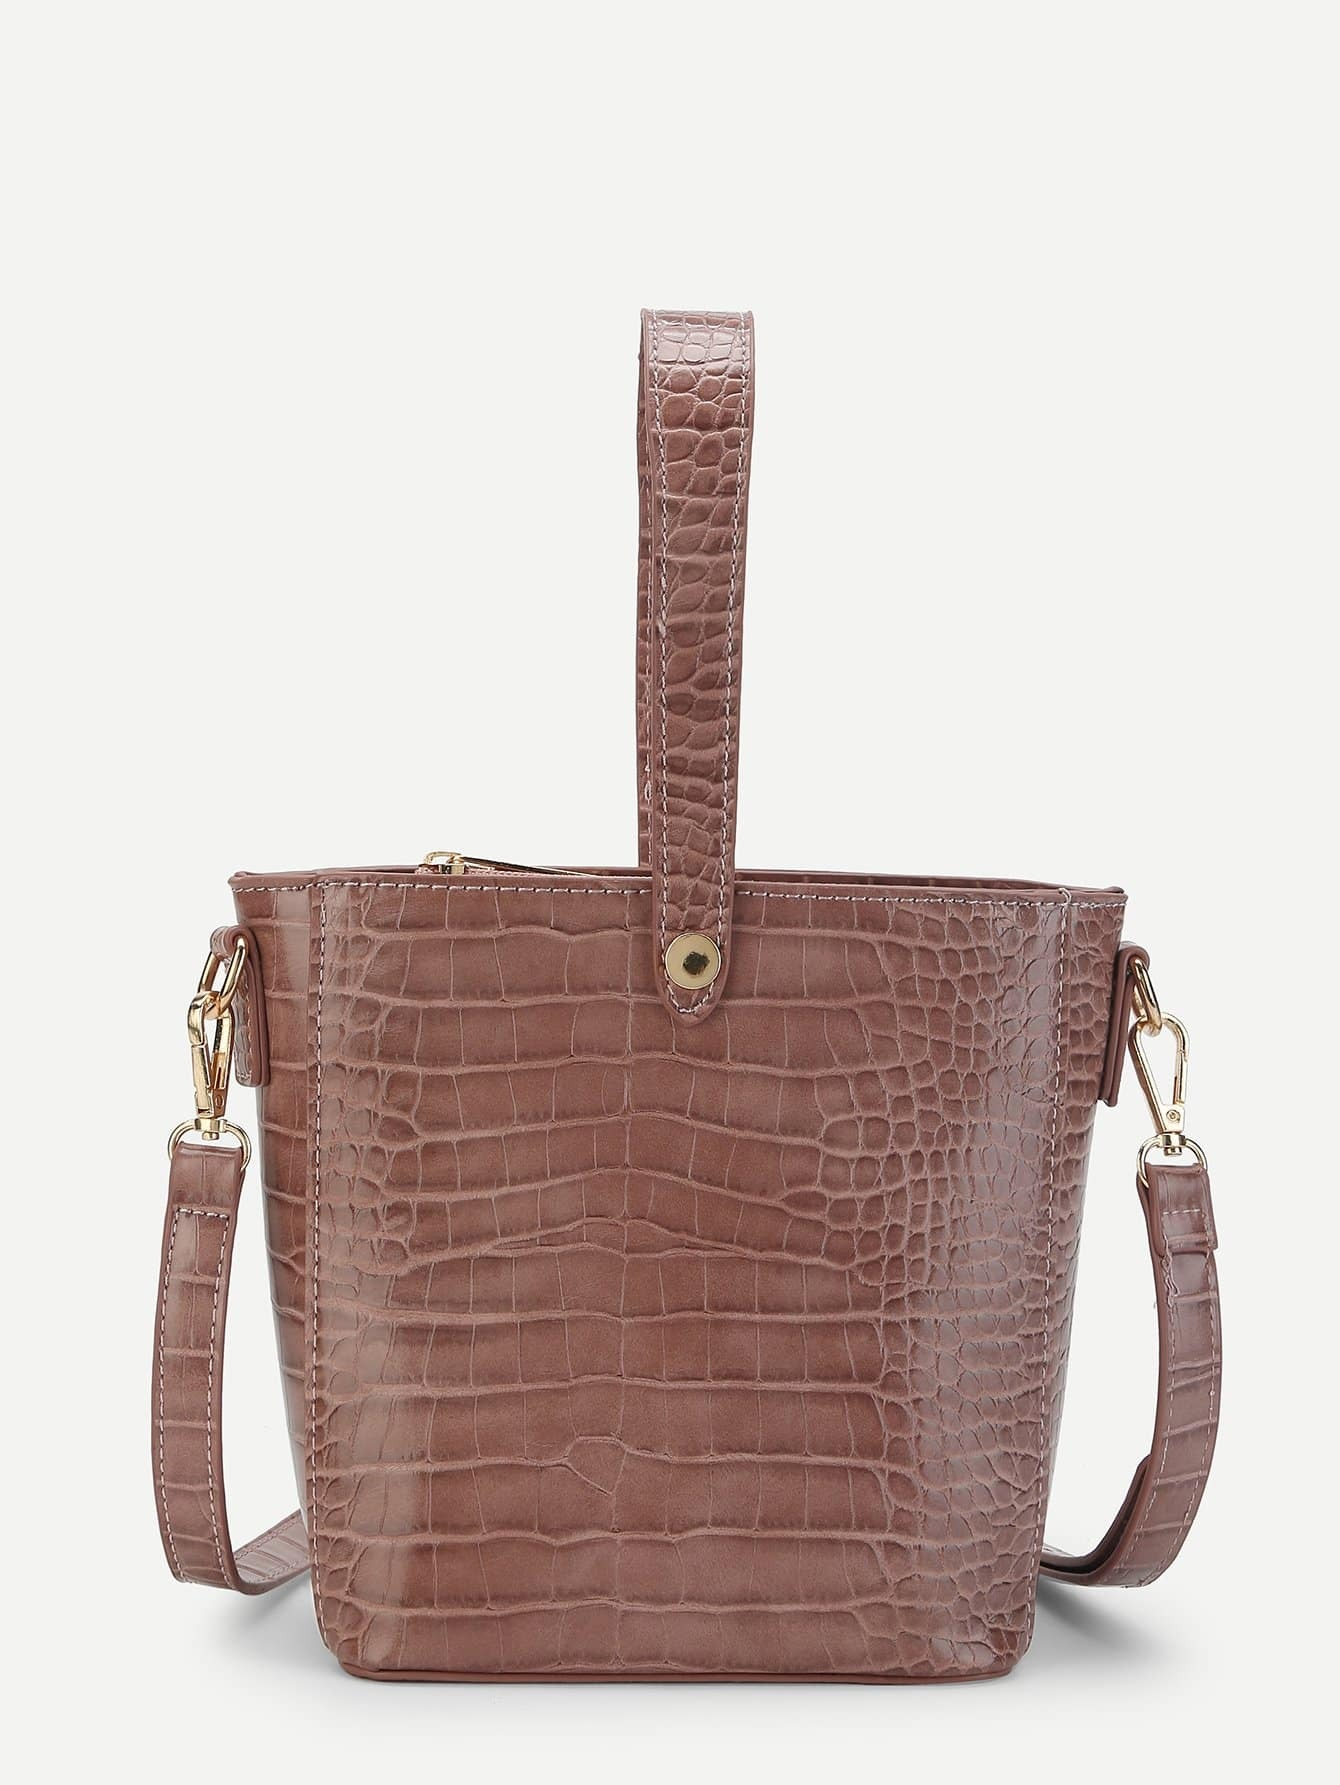 Crocodile Pattern Shoulder Bag luxurious crocodile pattern shoulder bag 100